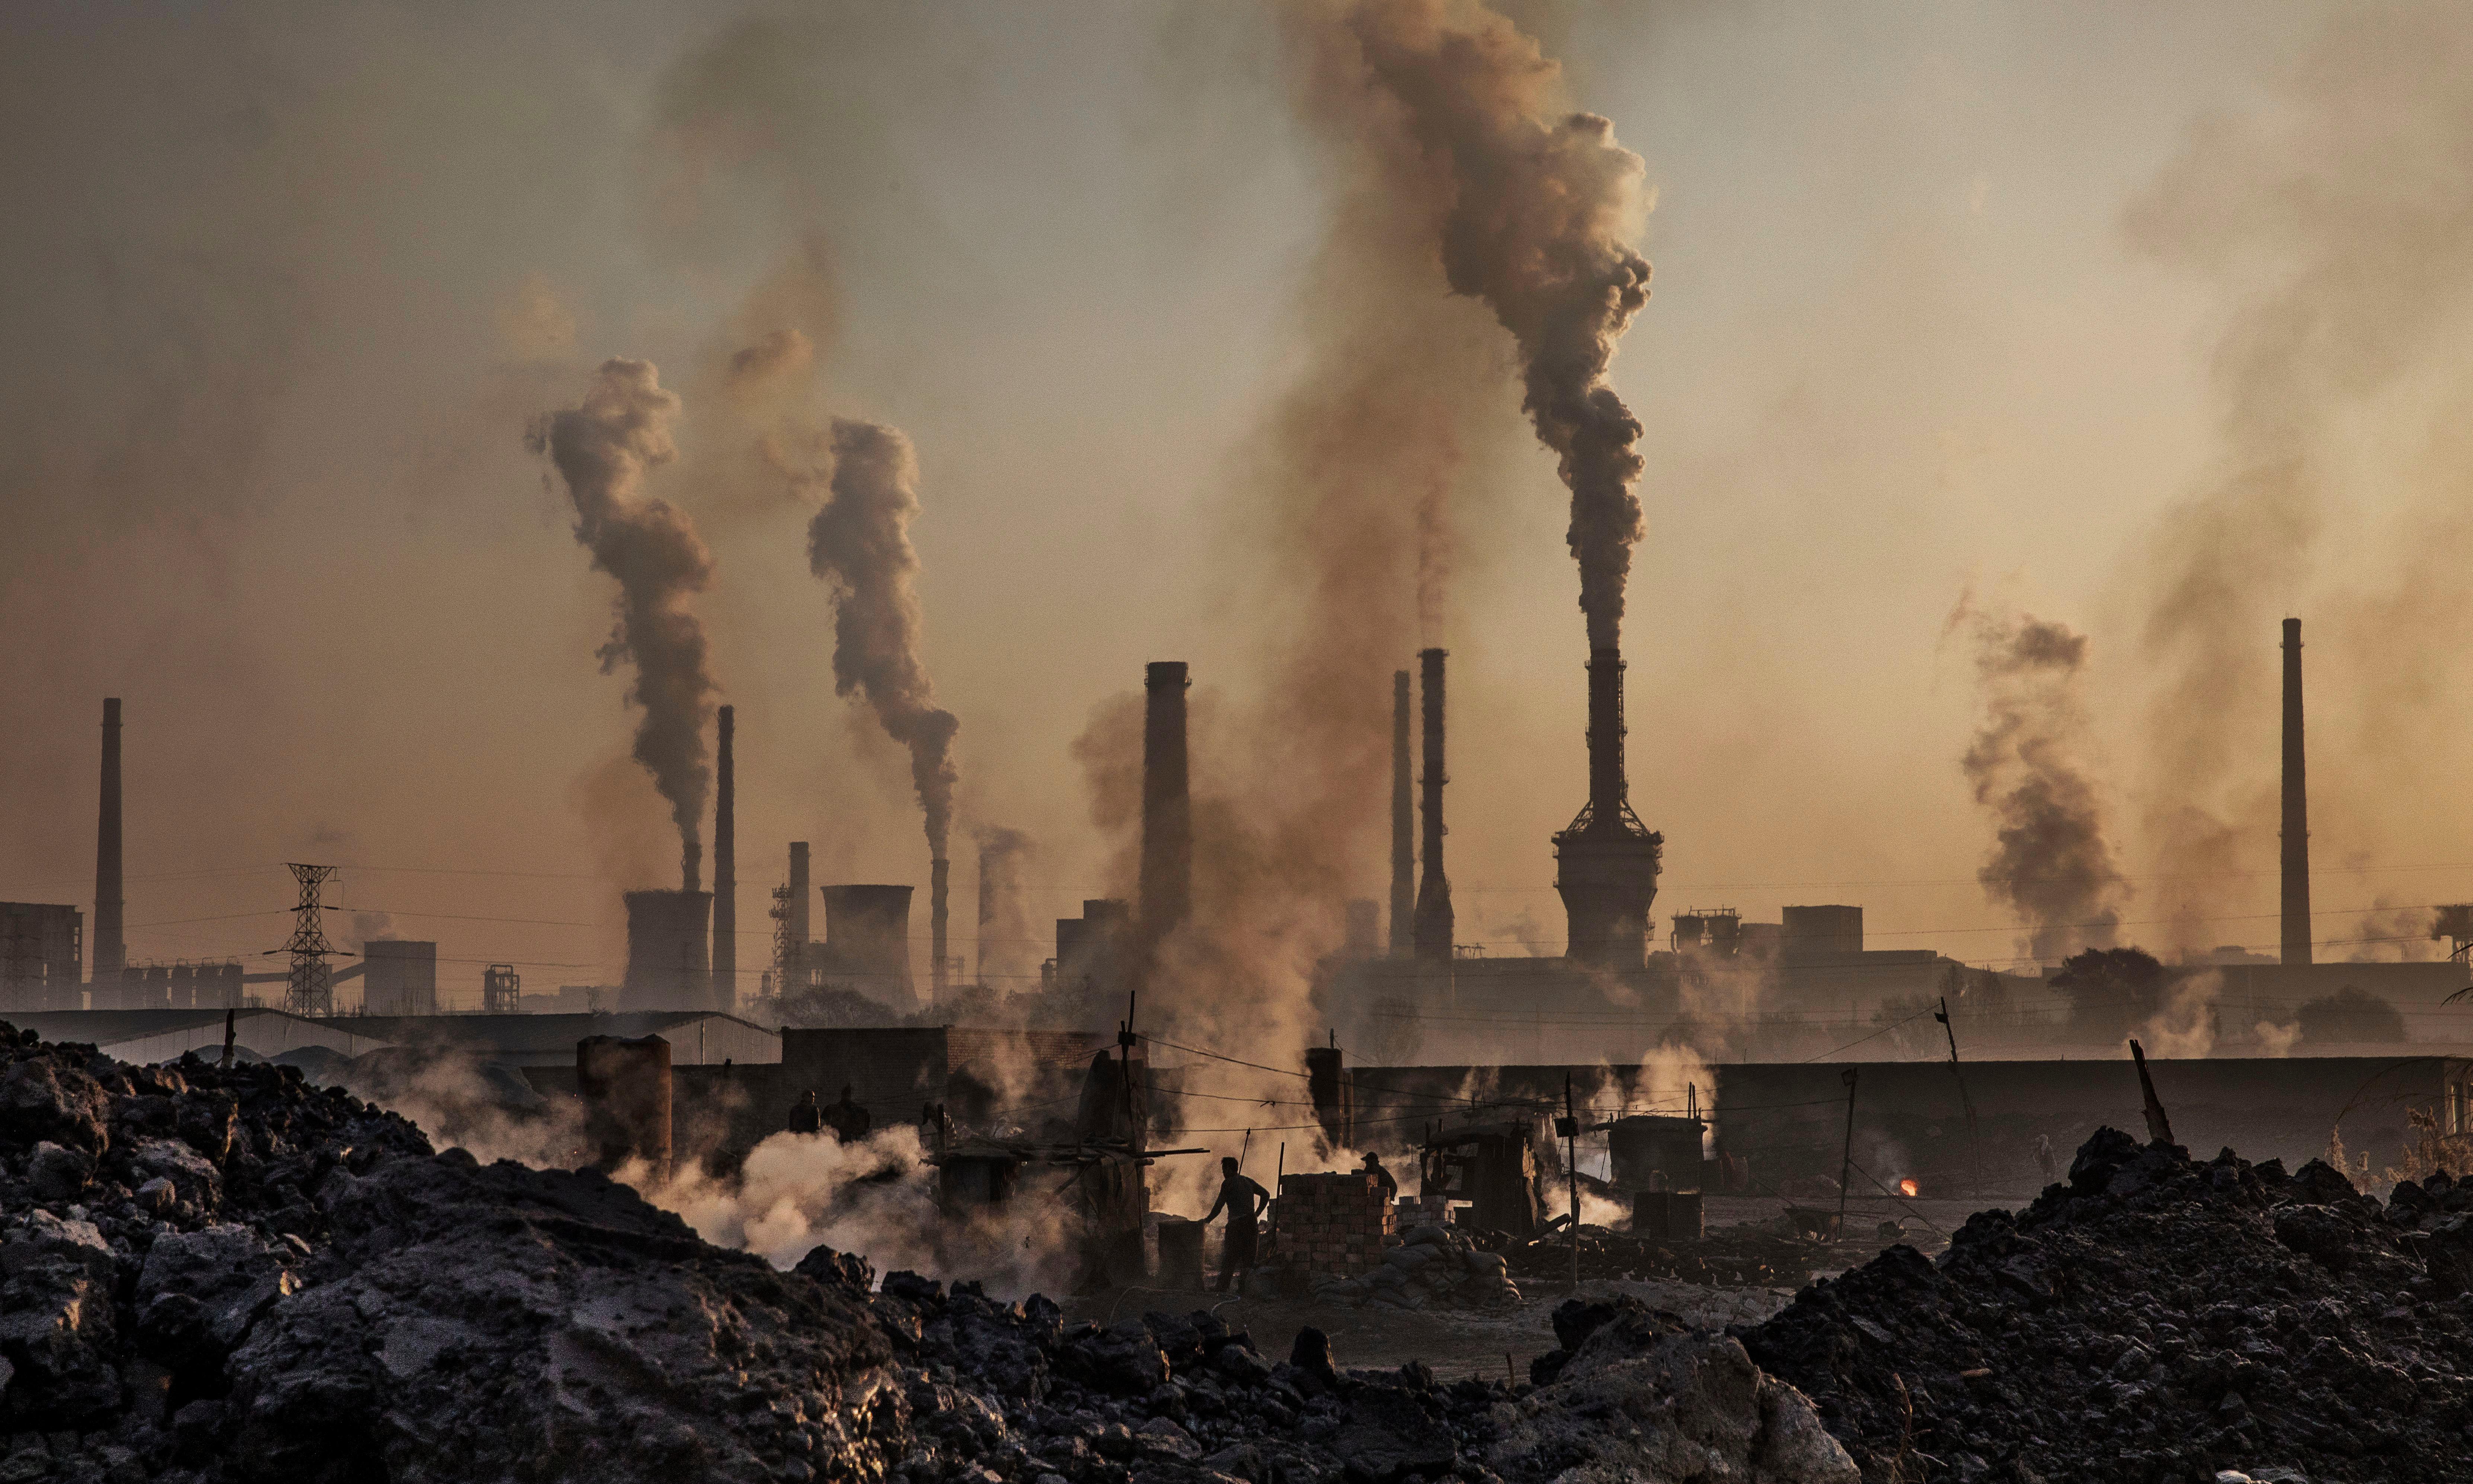 Climate change isn't a joke. Republicans should stop treating it like one